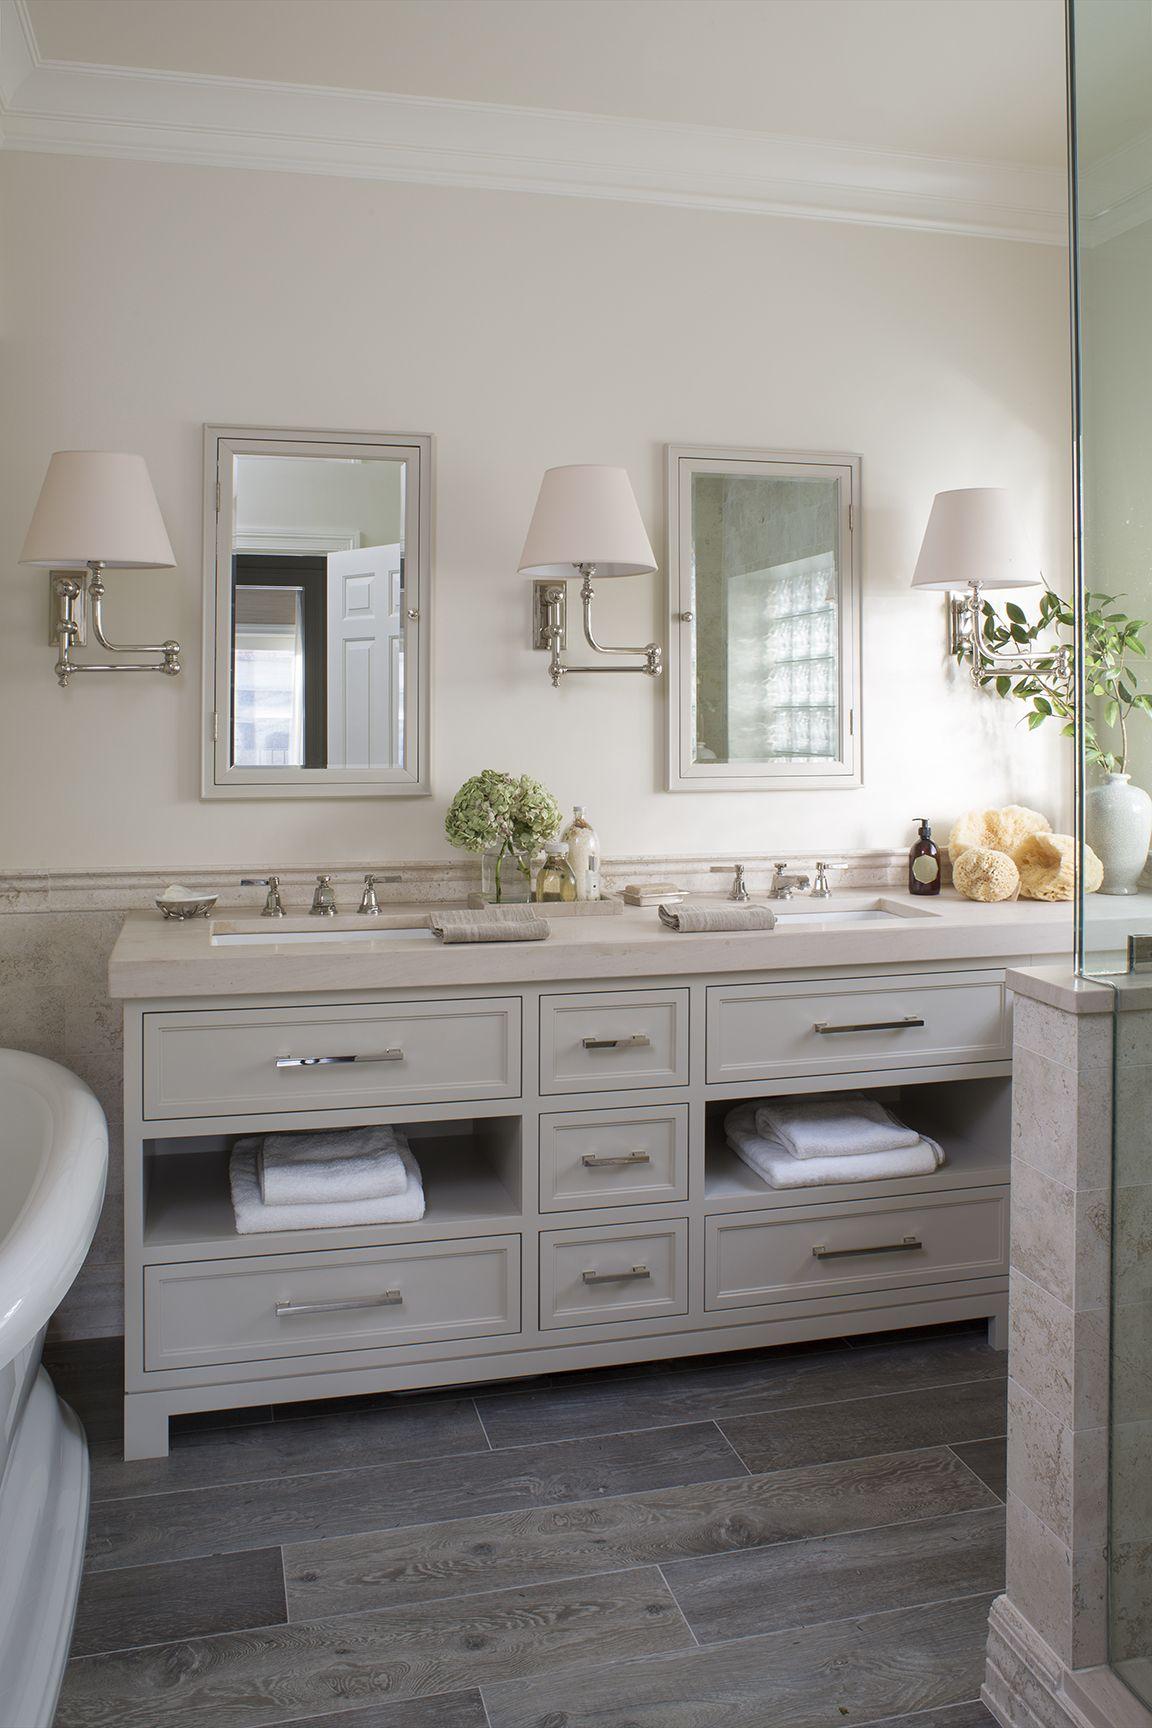 A Modern Tailored Home By Wendy Labrum La Dolce Vita Grey Bathrooms Designs Beige Bathroom Cream And Grey Bathroom [ 1728 x 1152 Pixel ]